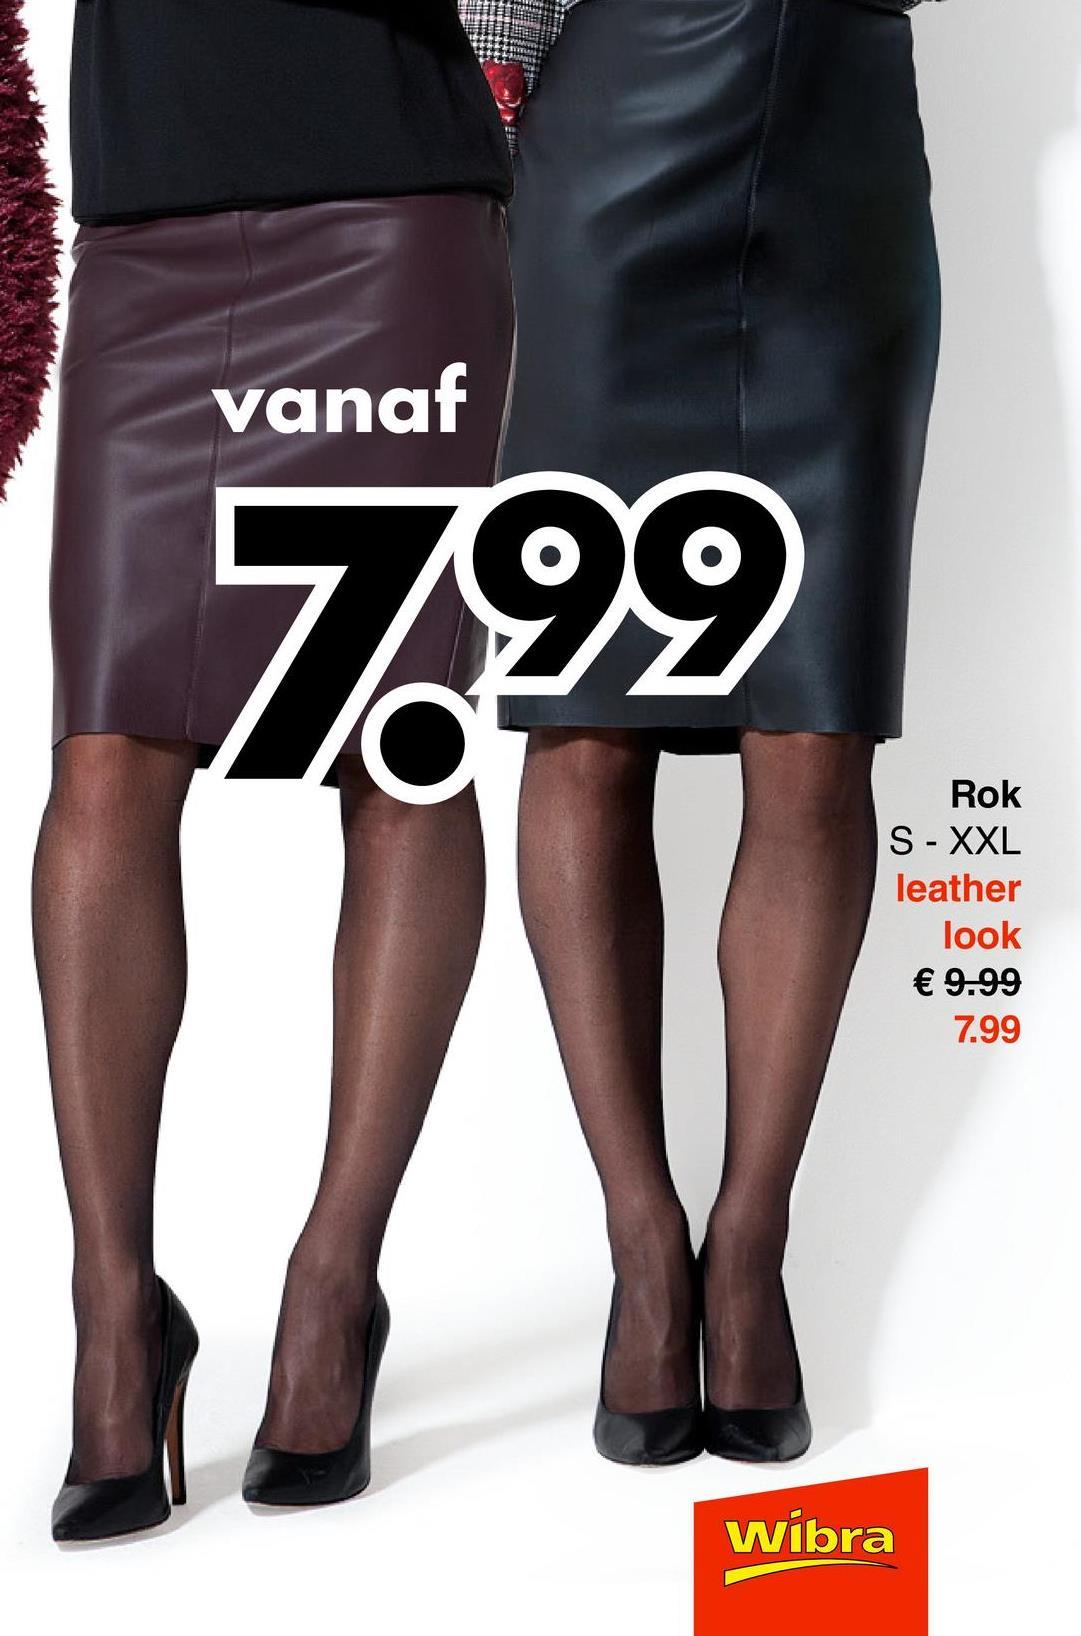 vanaf 1799 Rok S - XXL leather look € 9.99 7.99 Wibra